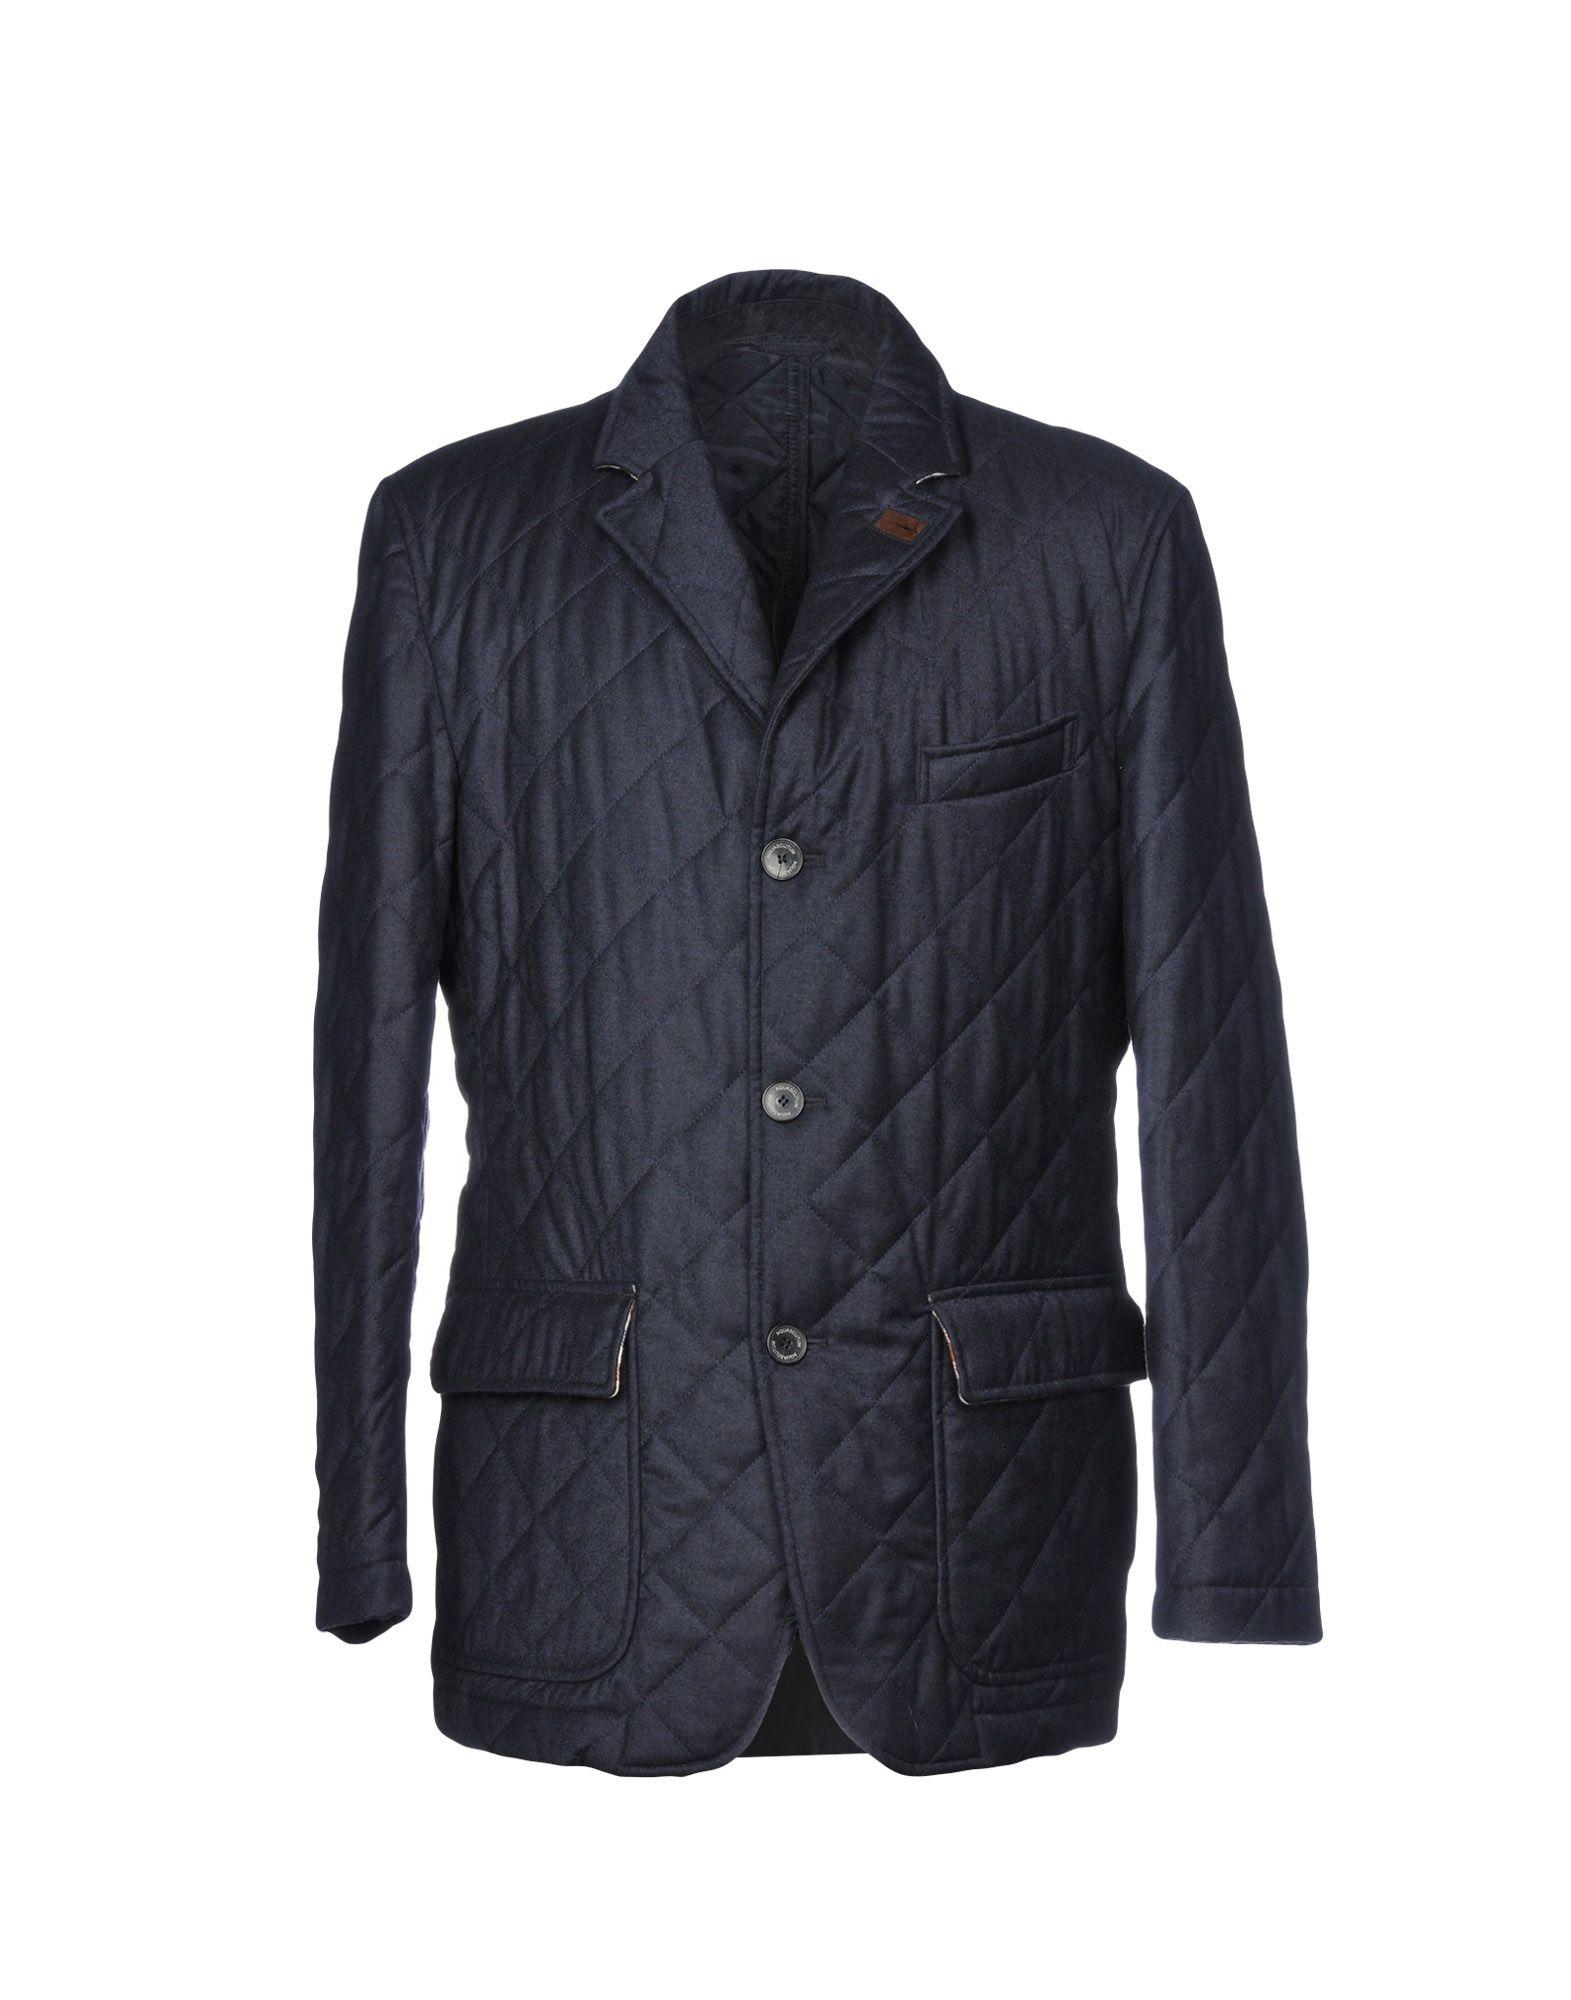 AQUASCUTUM Coat in Dark Blue